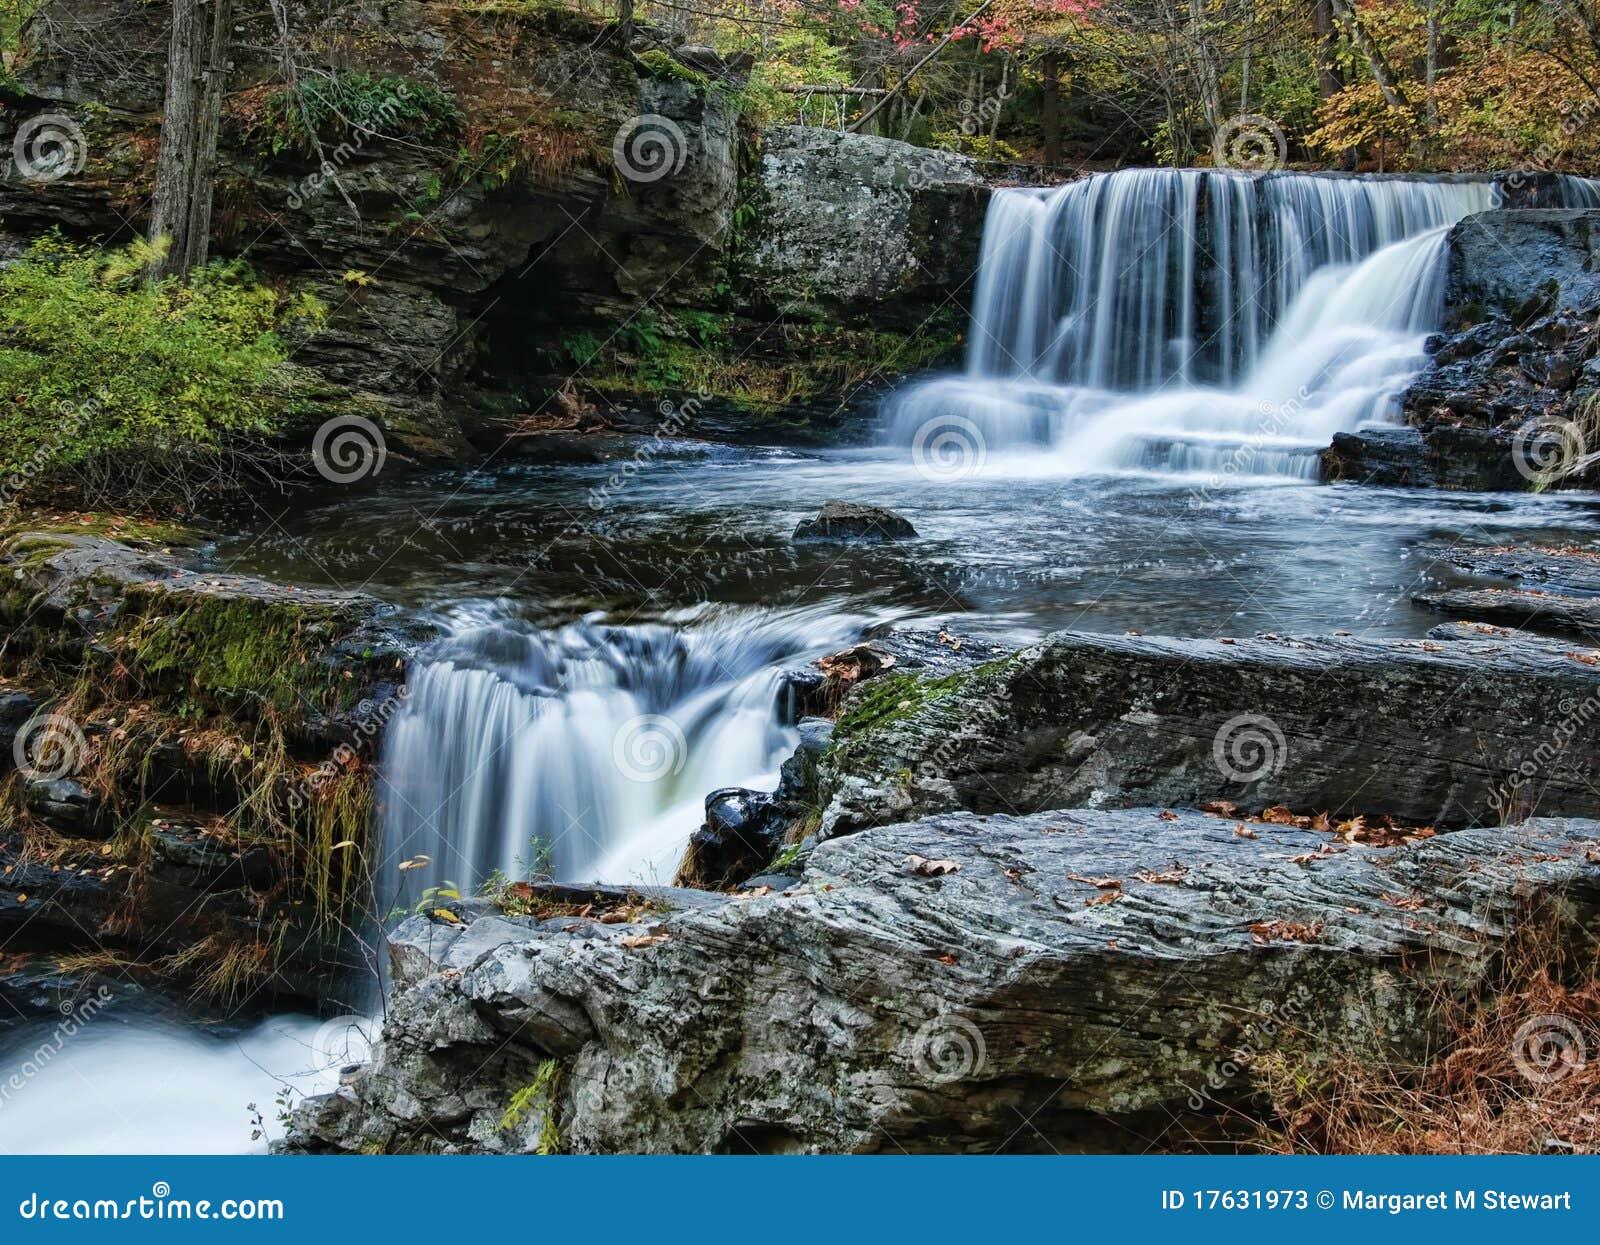 Waterfalls In The Poconos Stock Photos - Image: 17631973